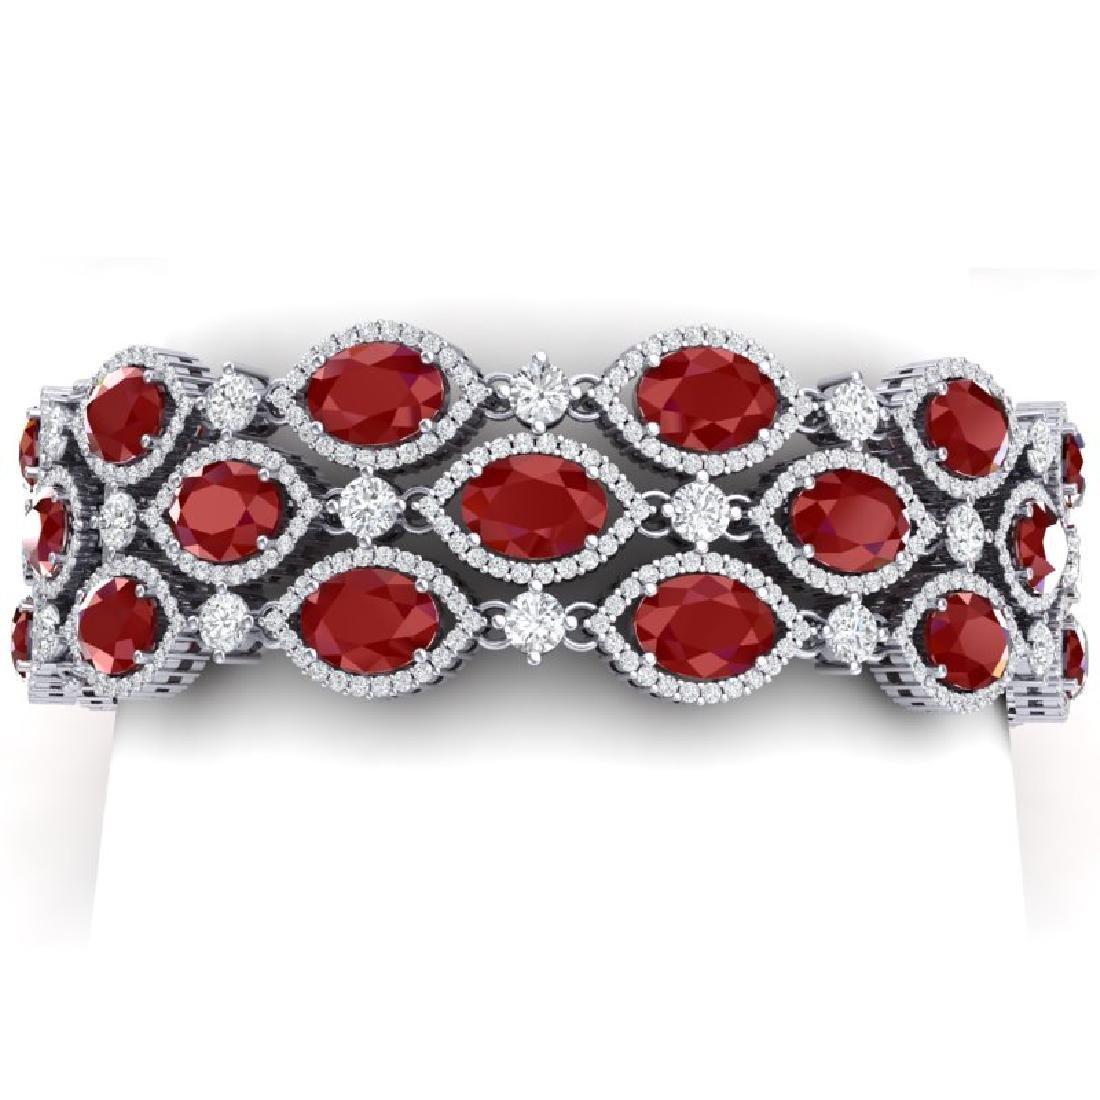 47.84 CTW Royalty Ruby & VS Diamond Bracelet 18K White